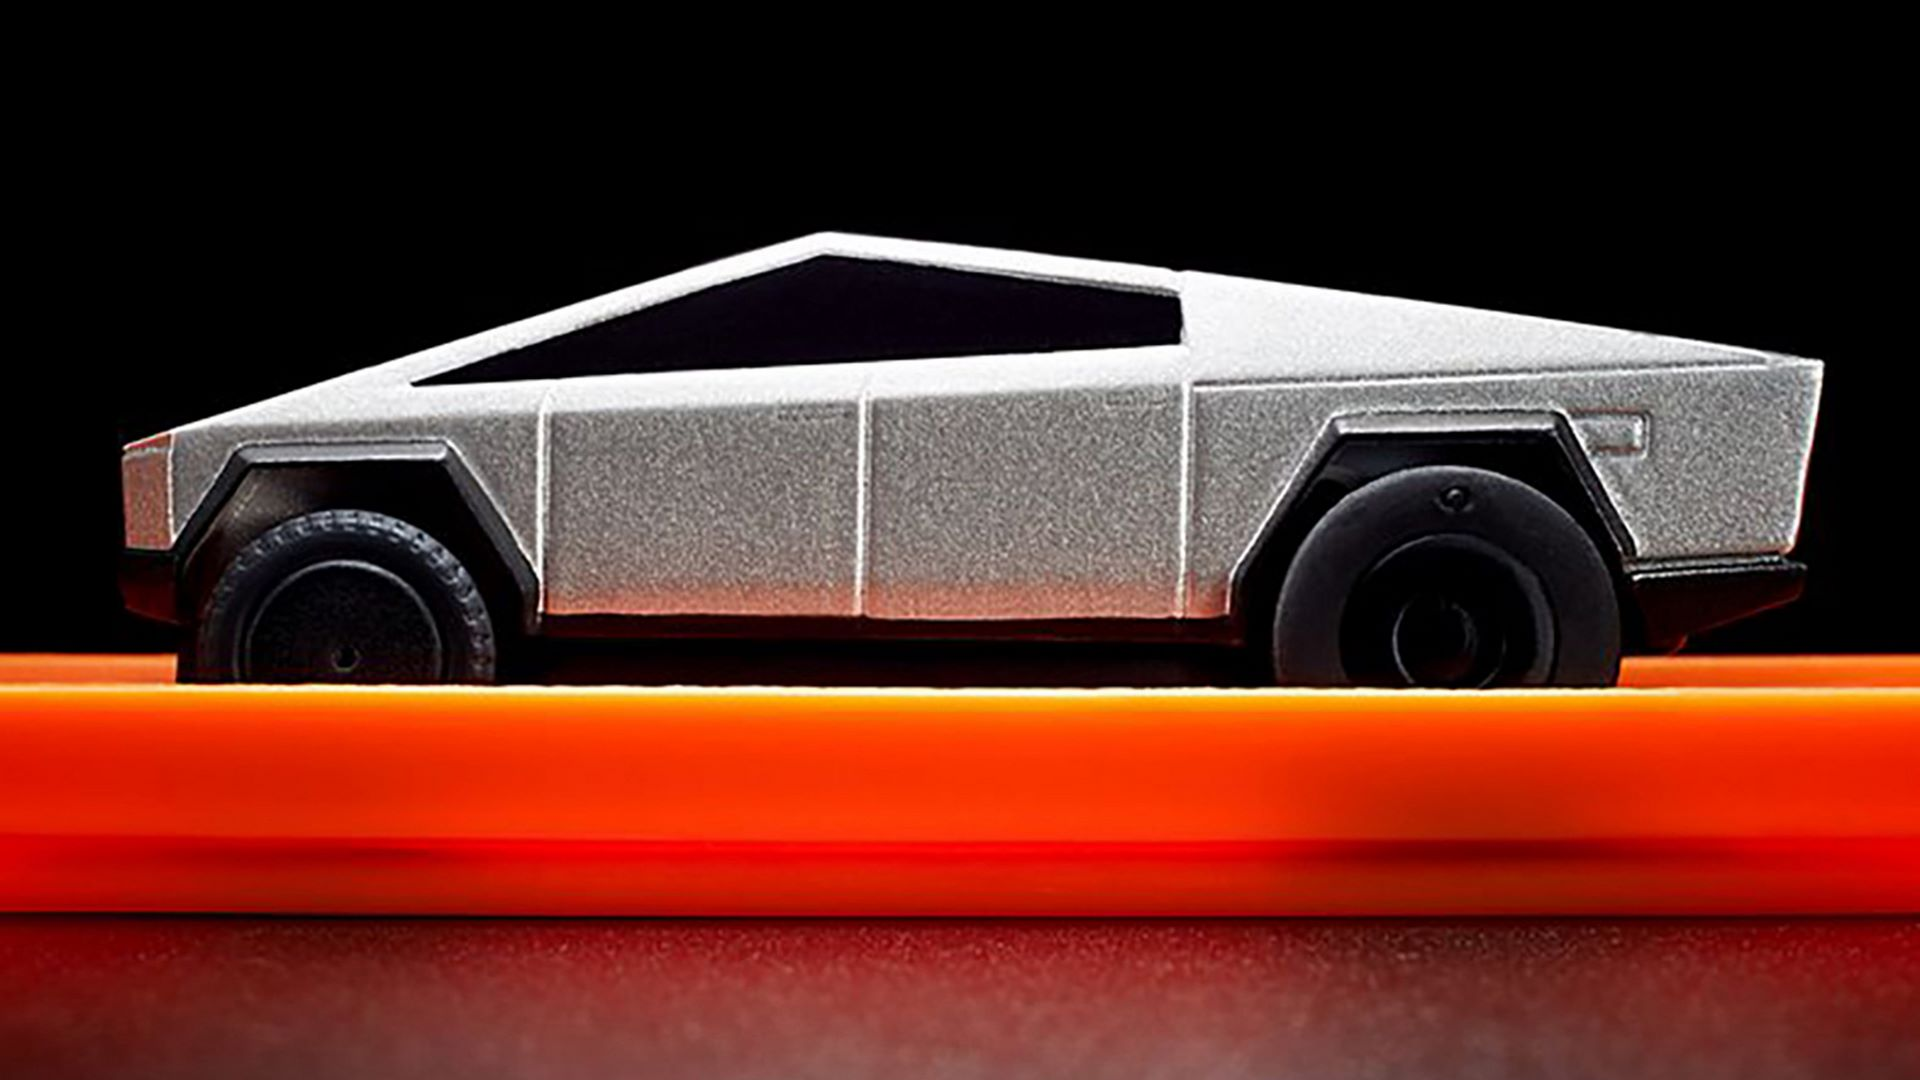 Hot-Wheels-RC-Tesla-Cybertruck-9